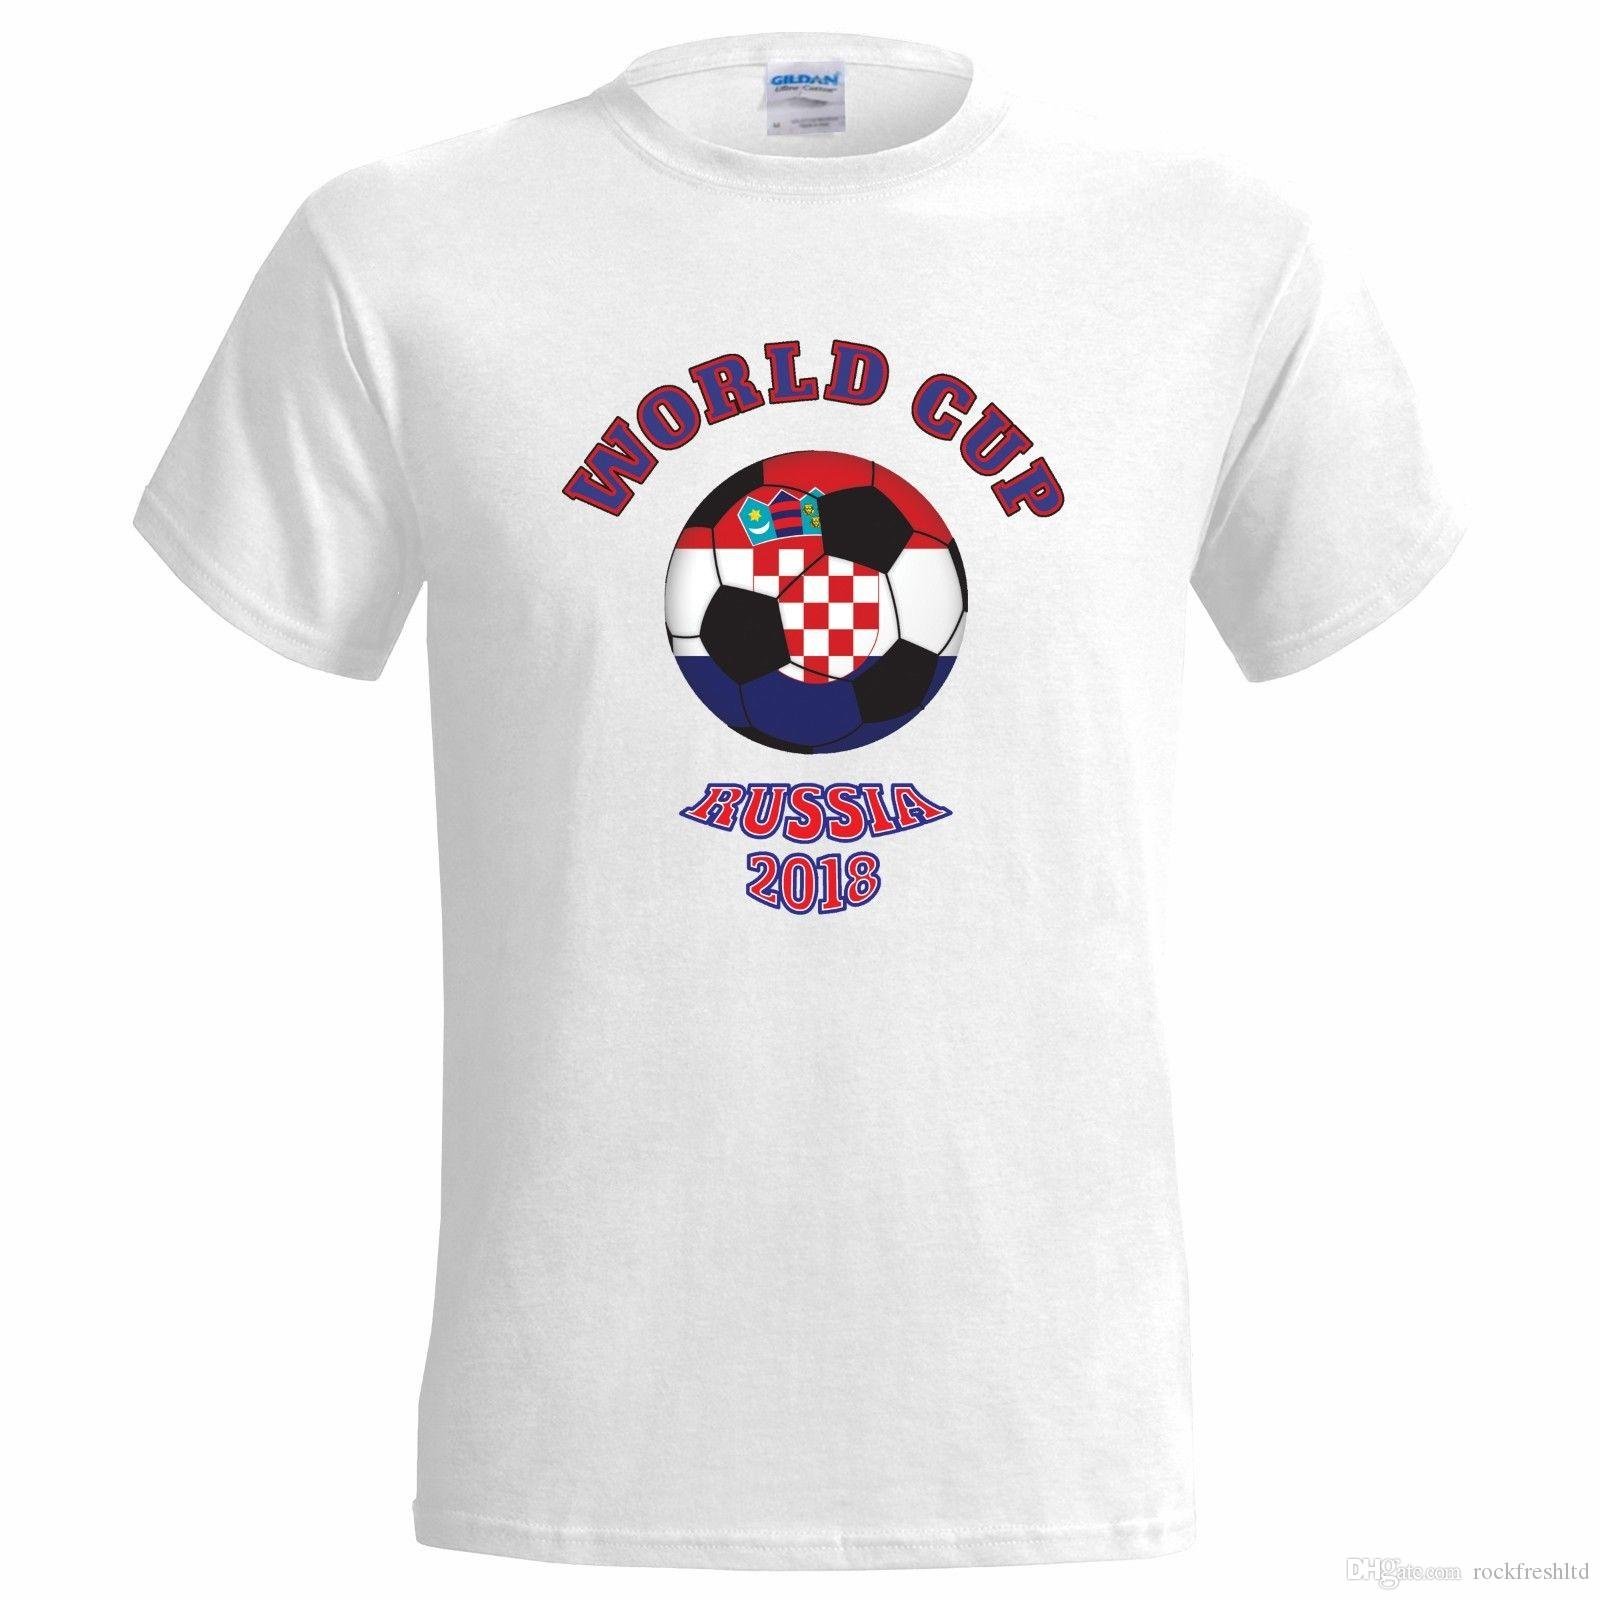 0fcc5a54fc8 CROATIA BALL WORLD CUP RUSSIA 2018 MENS T SHIRT FOOTBALL FAN SOCCER TEAM  Mens Funny T Shirts Buy Shirts From Rockfreshltd